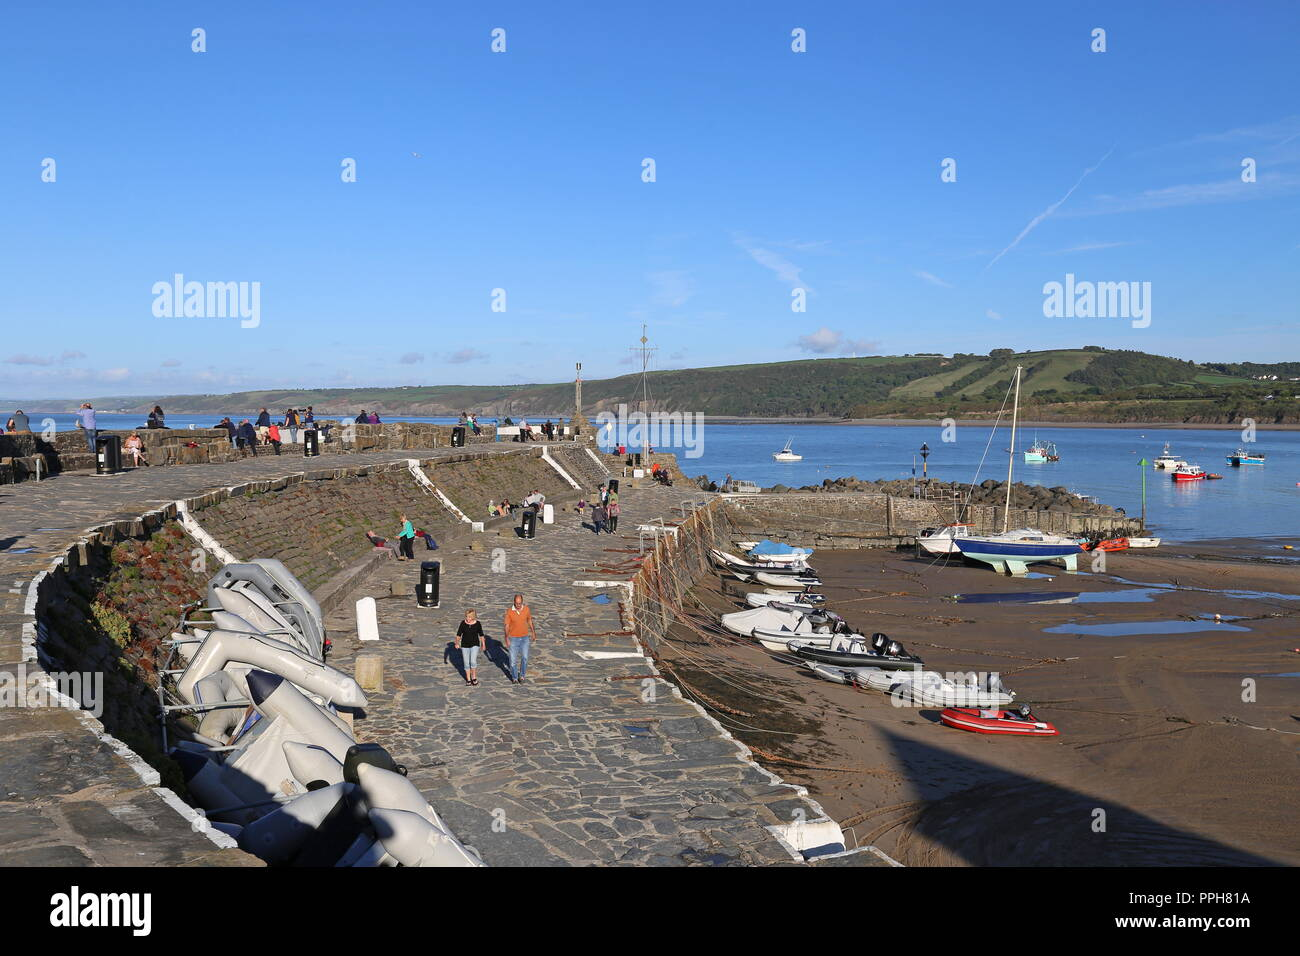 New Quay Harbour, Cardigan Bay, Ceredigion, Wales, Great Britain, United Kingdom, UK, Europe - Stock Image